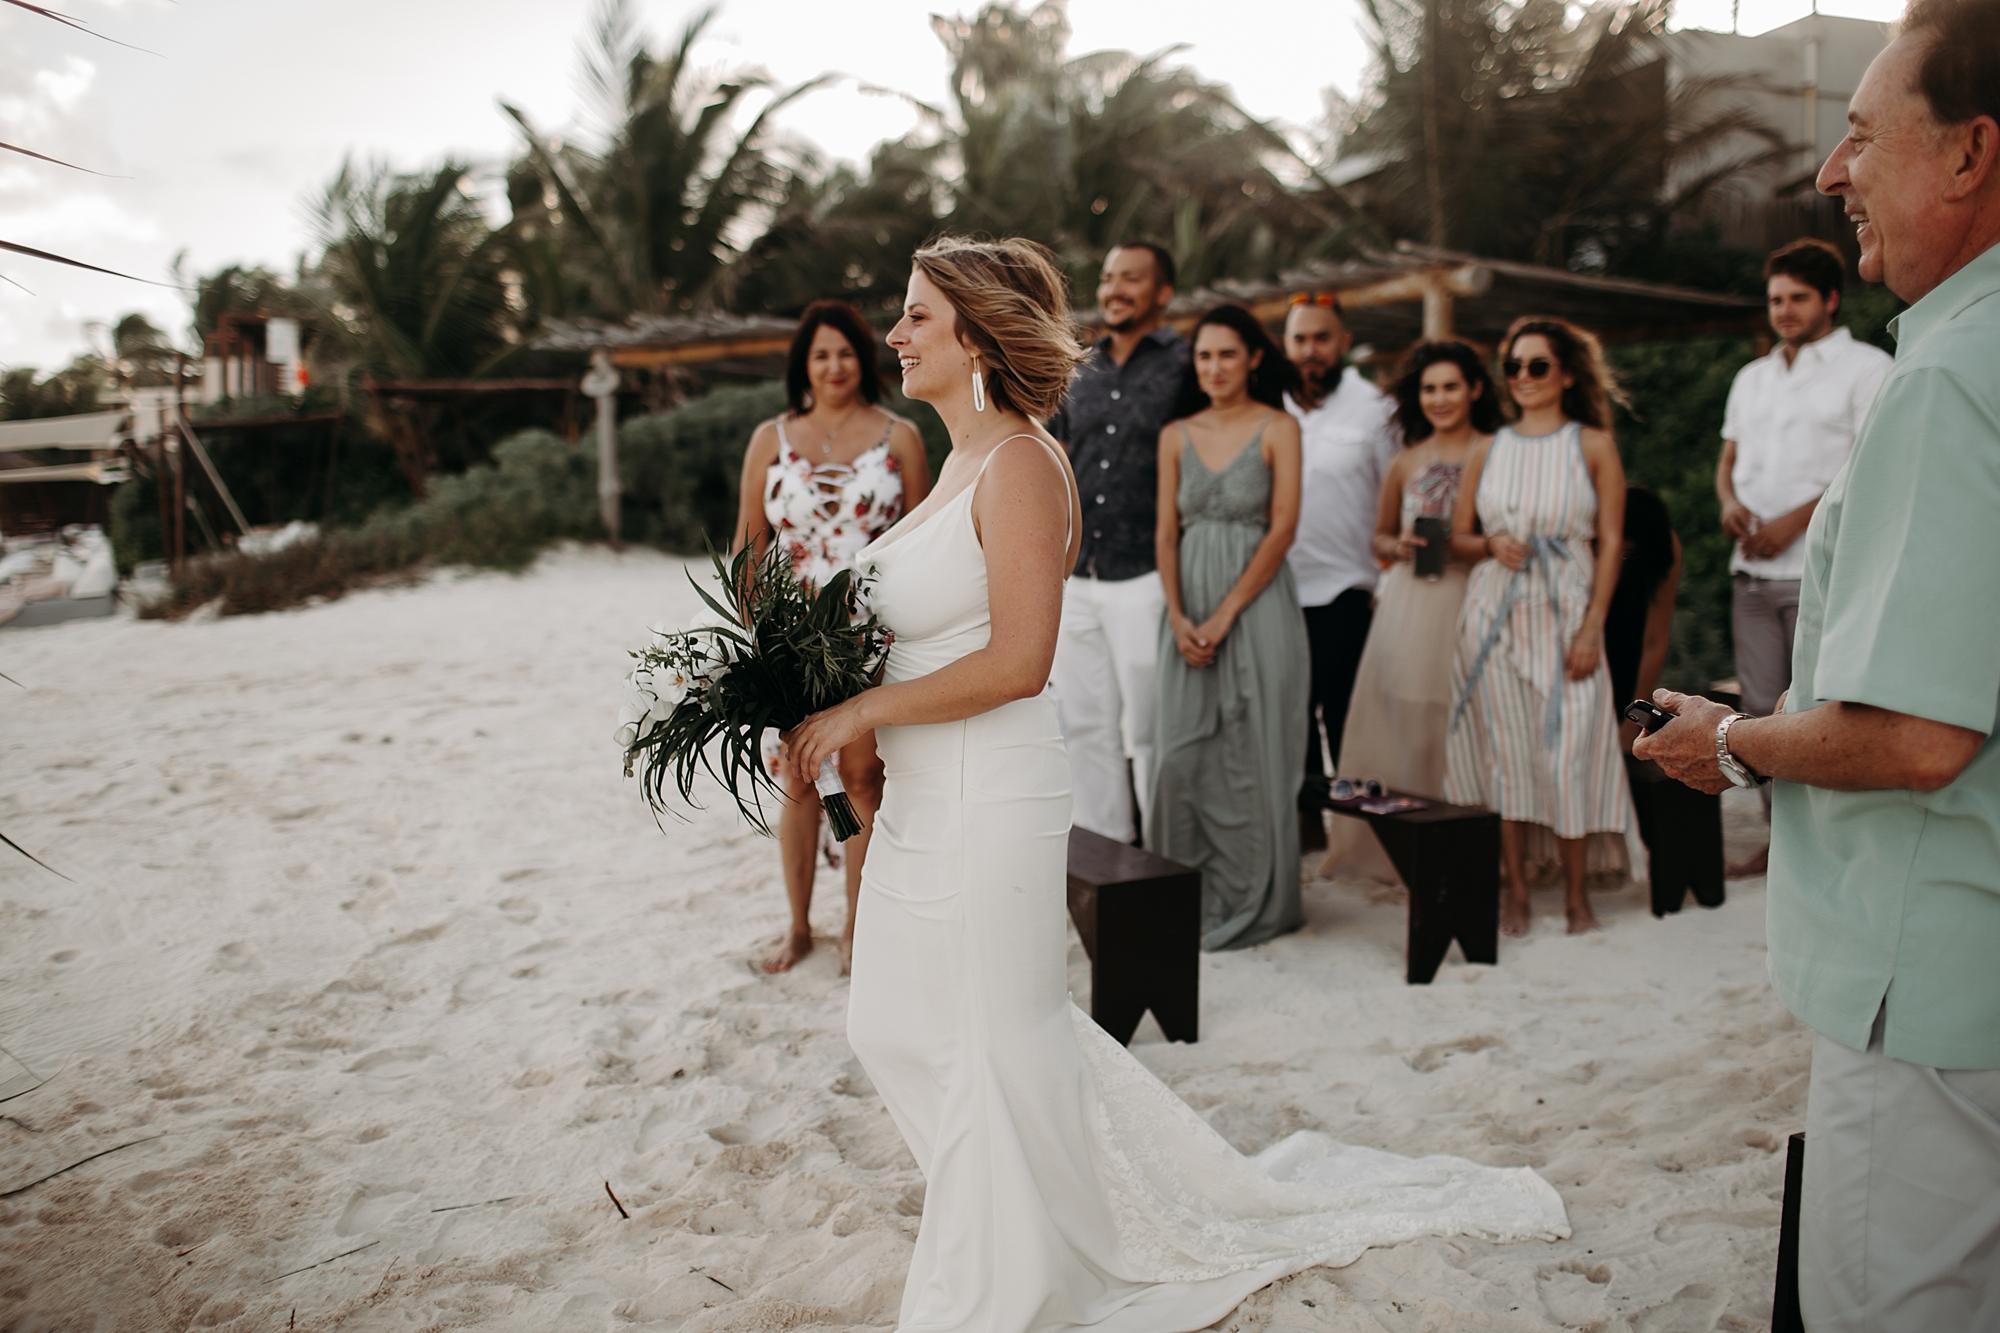 Danielle-San-Antonio-Wedding-Photographer-149_WEB.jpg